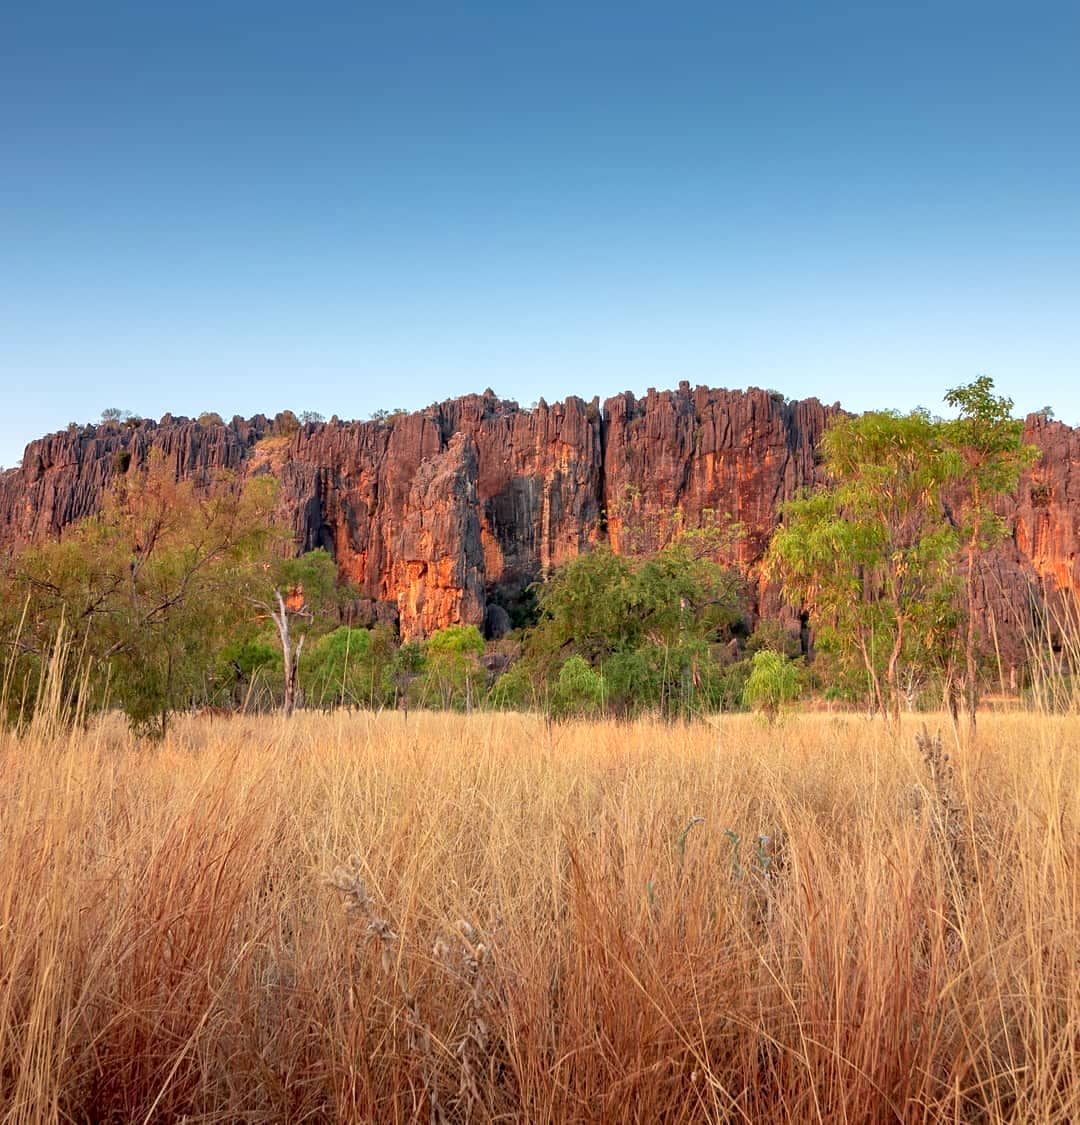 Bush ©Landscope_360 for Western Australia